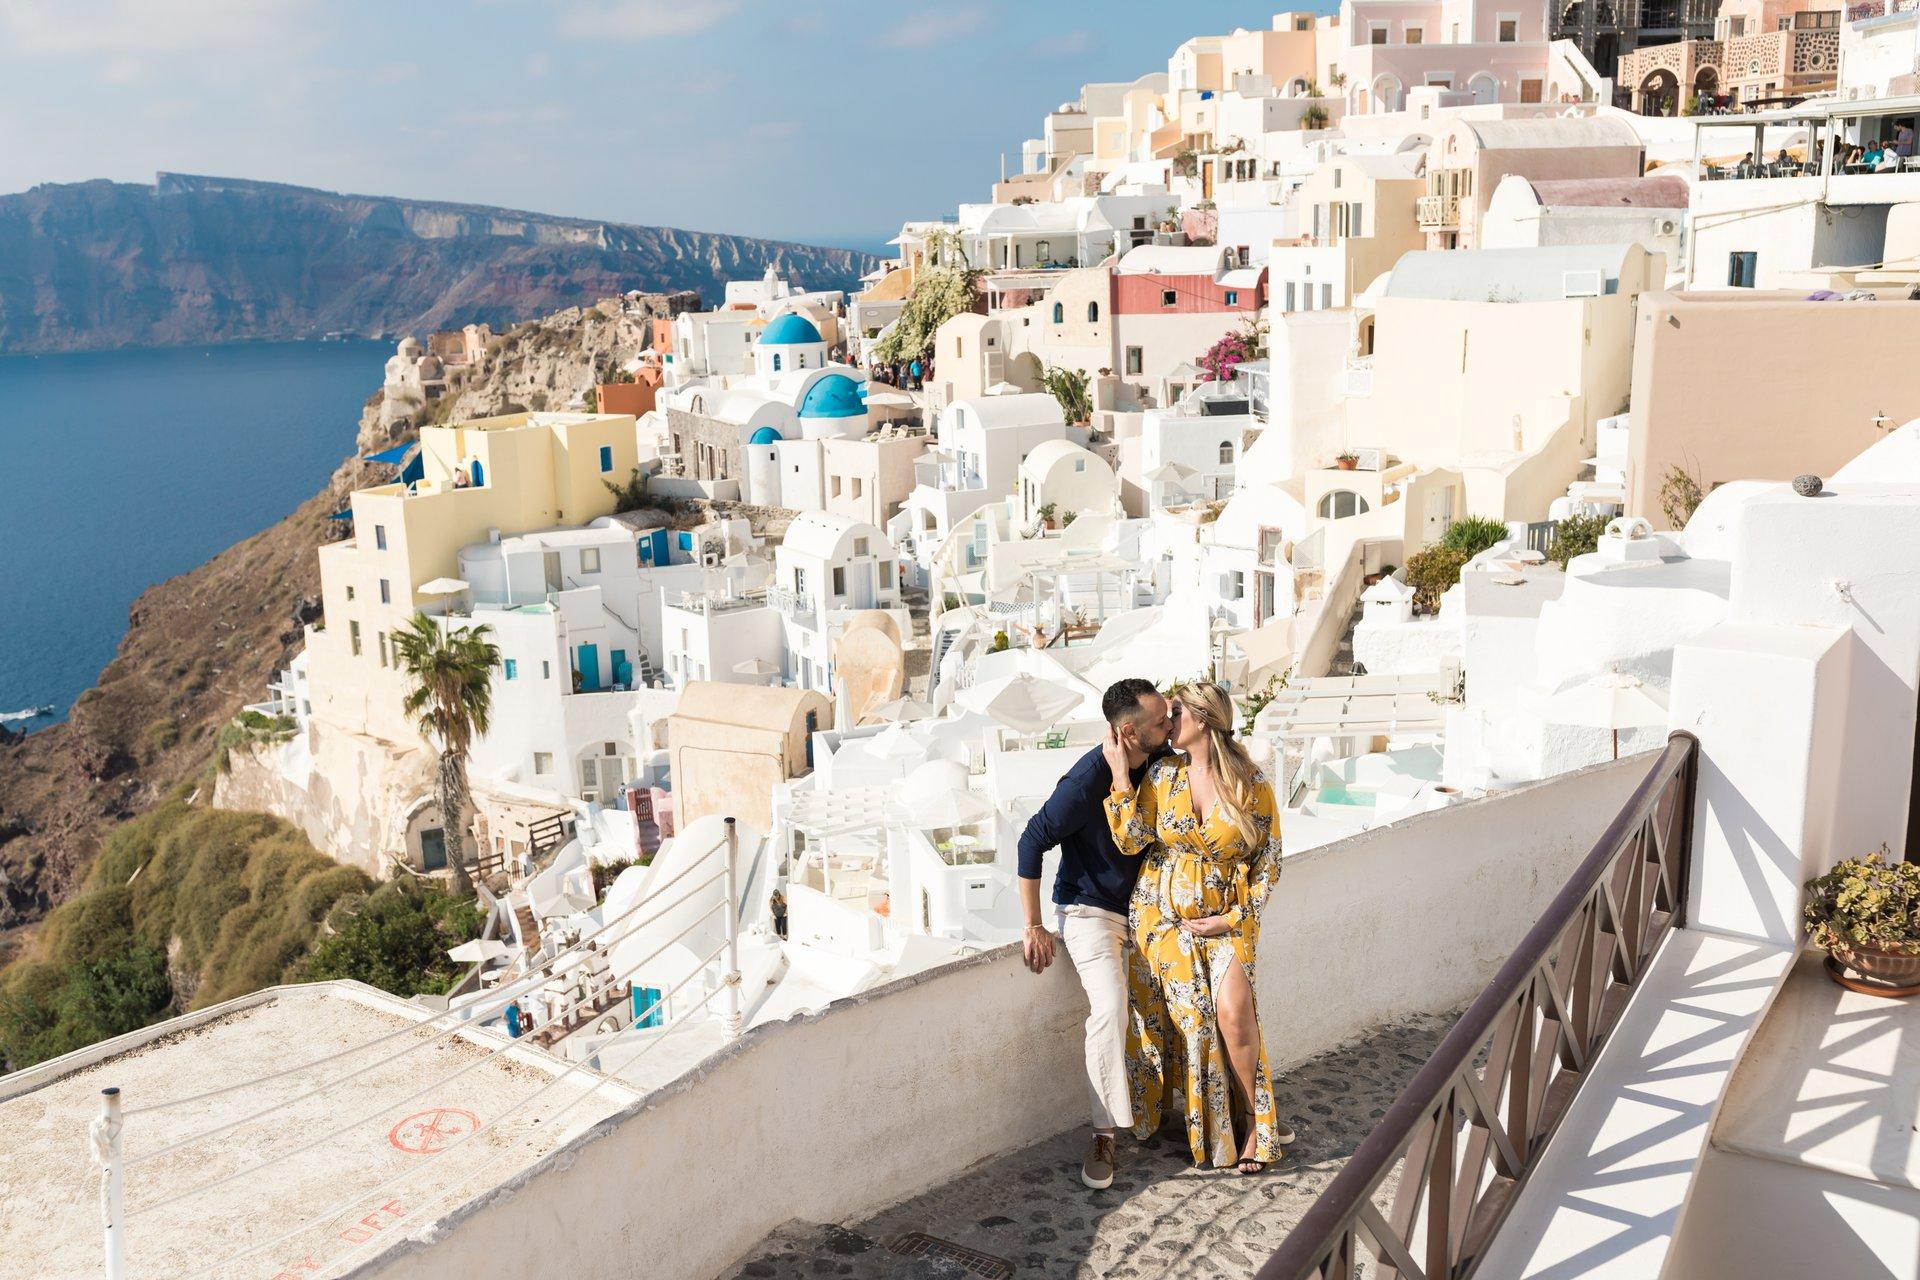 Santorini-Greece-travel-story-Flytographer-15